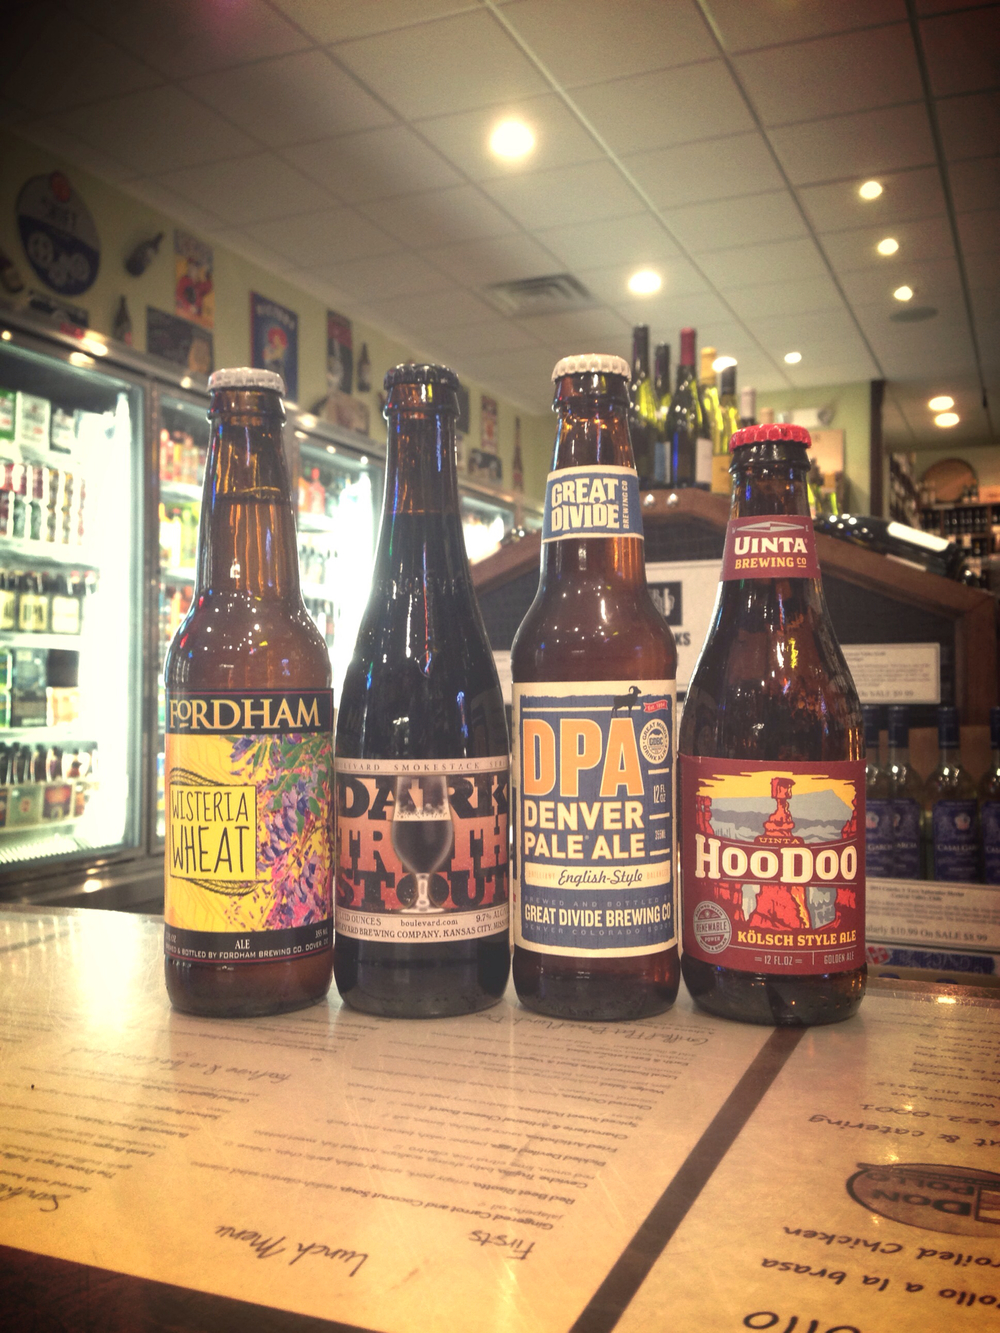 Fordham Wisteria Wheat, Boulevard Dark Truth Stout, Great Divide Denver Pale Ale, Uinta Hoodoo Kolsch